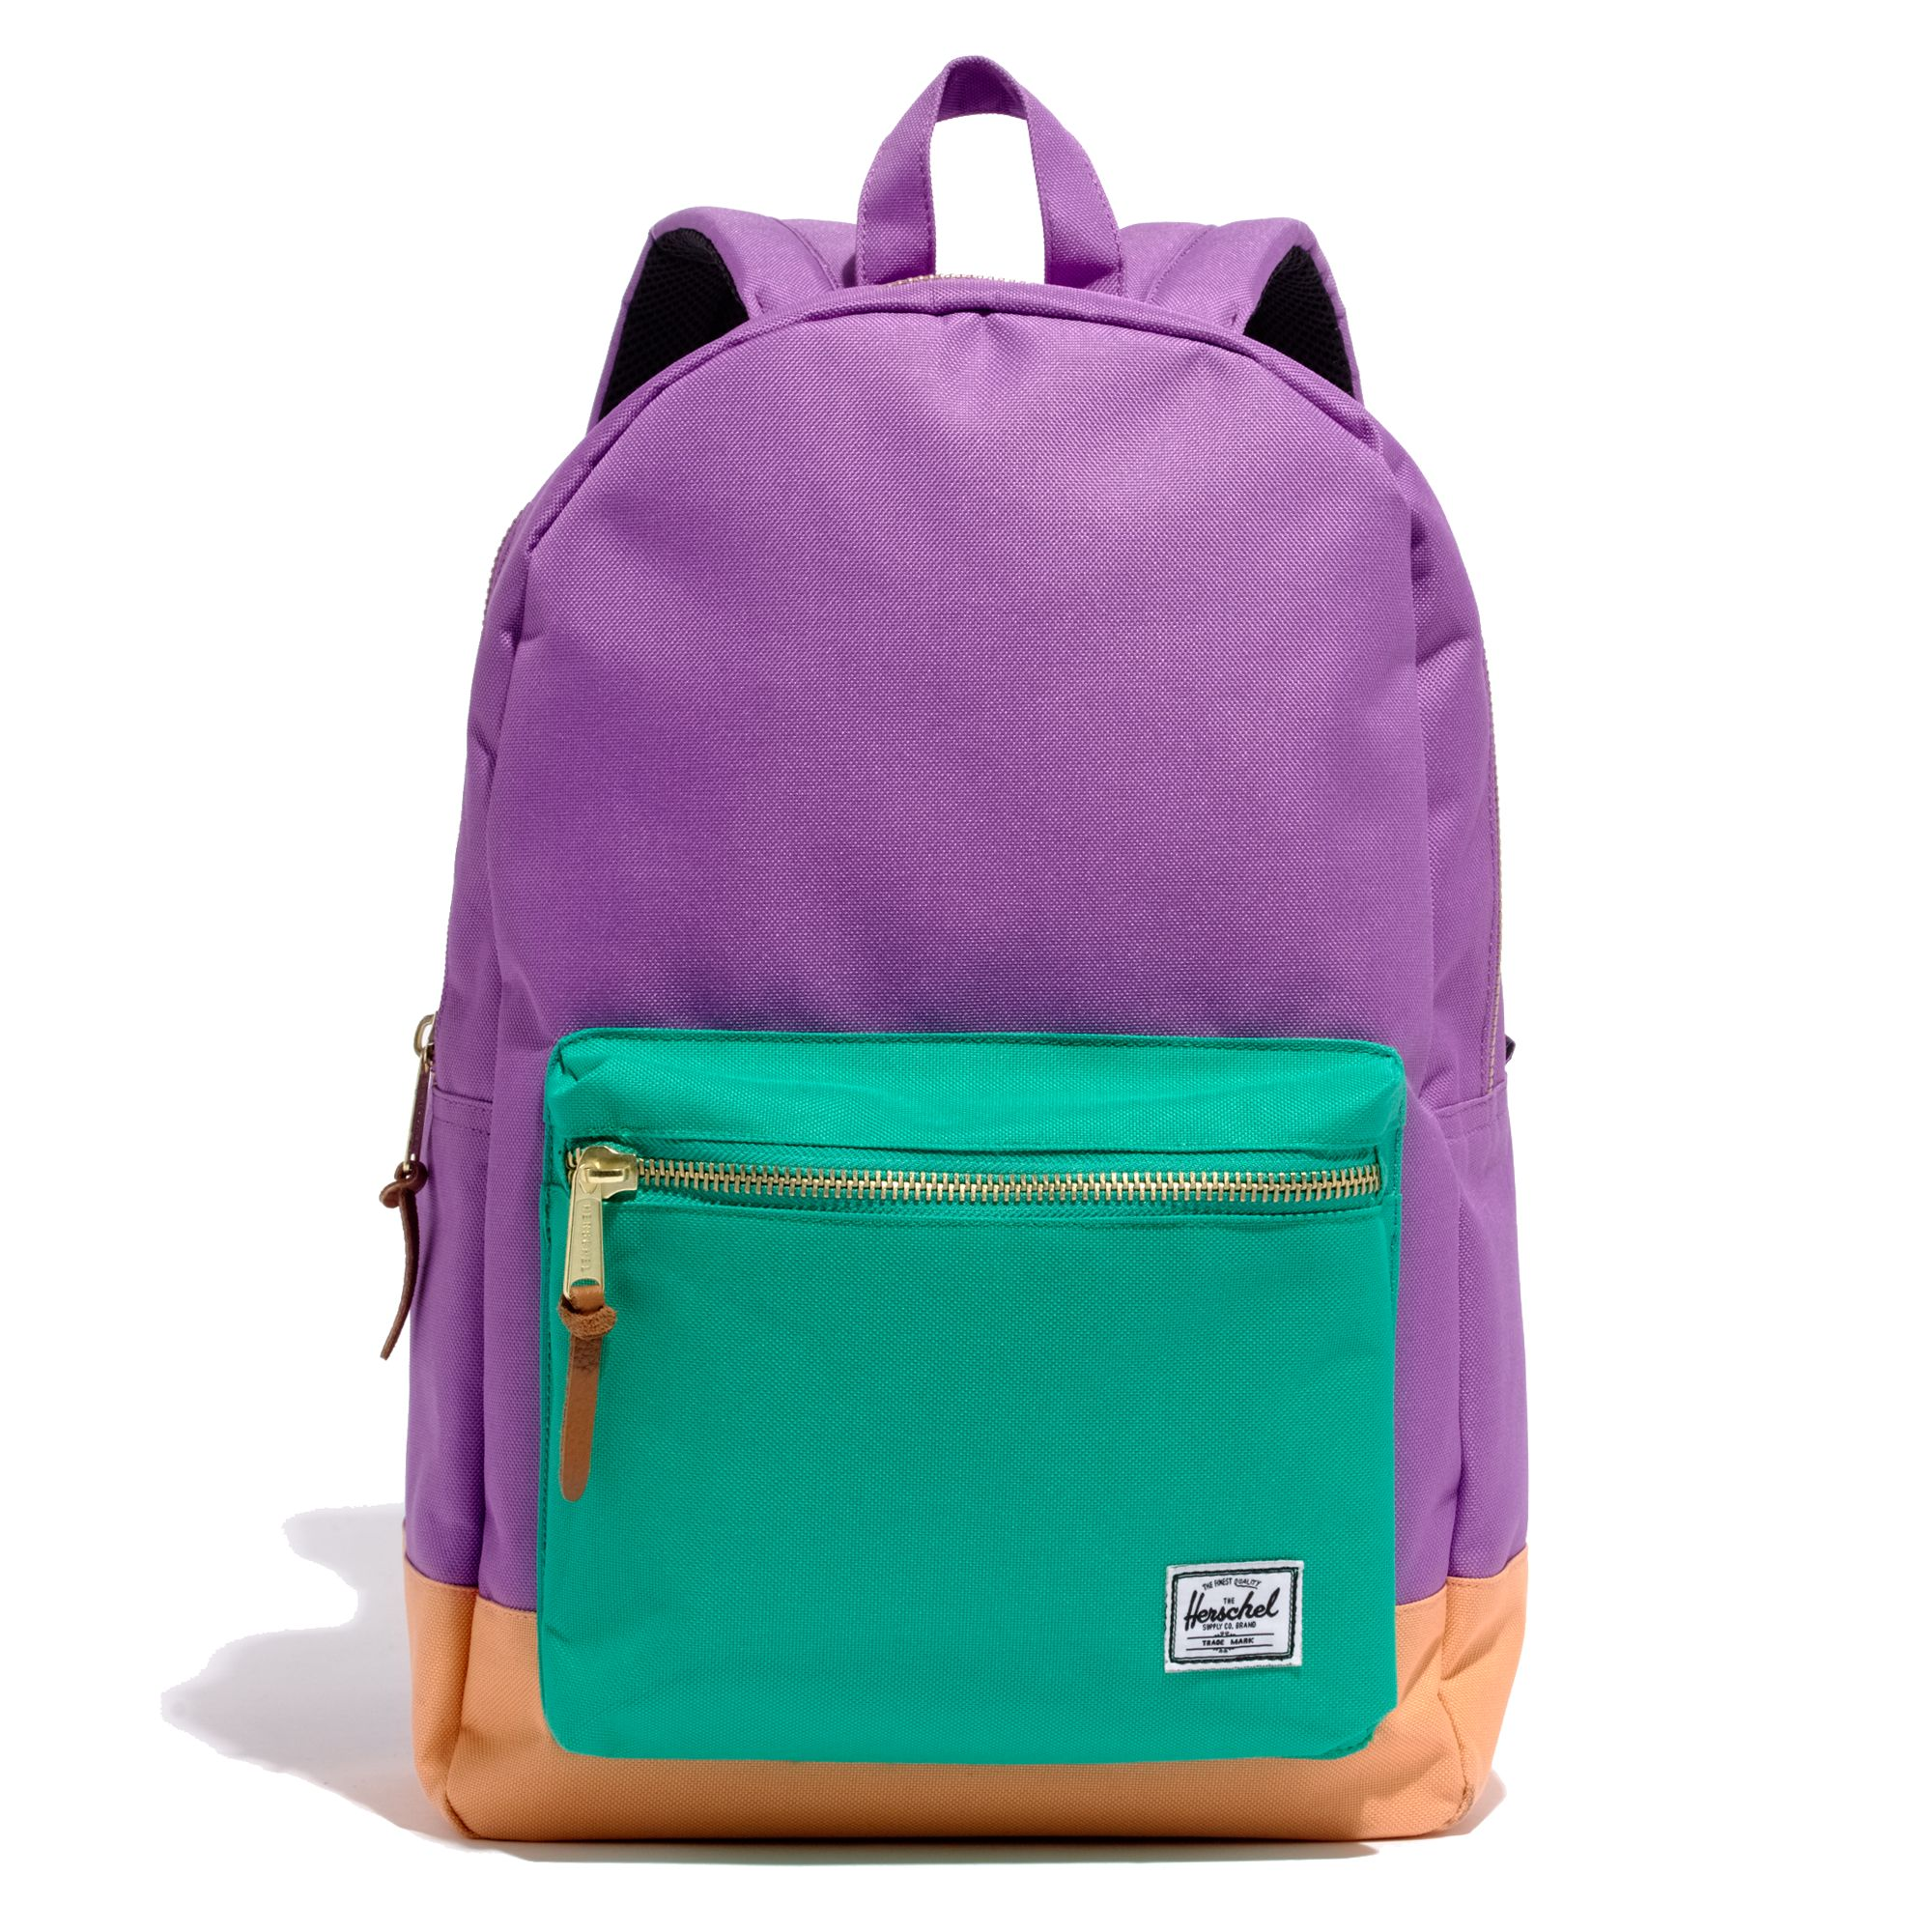 Lyst - Madewell Herschel Supply Coreg X Colorblock Backpack in Purple b0e488399bb18